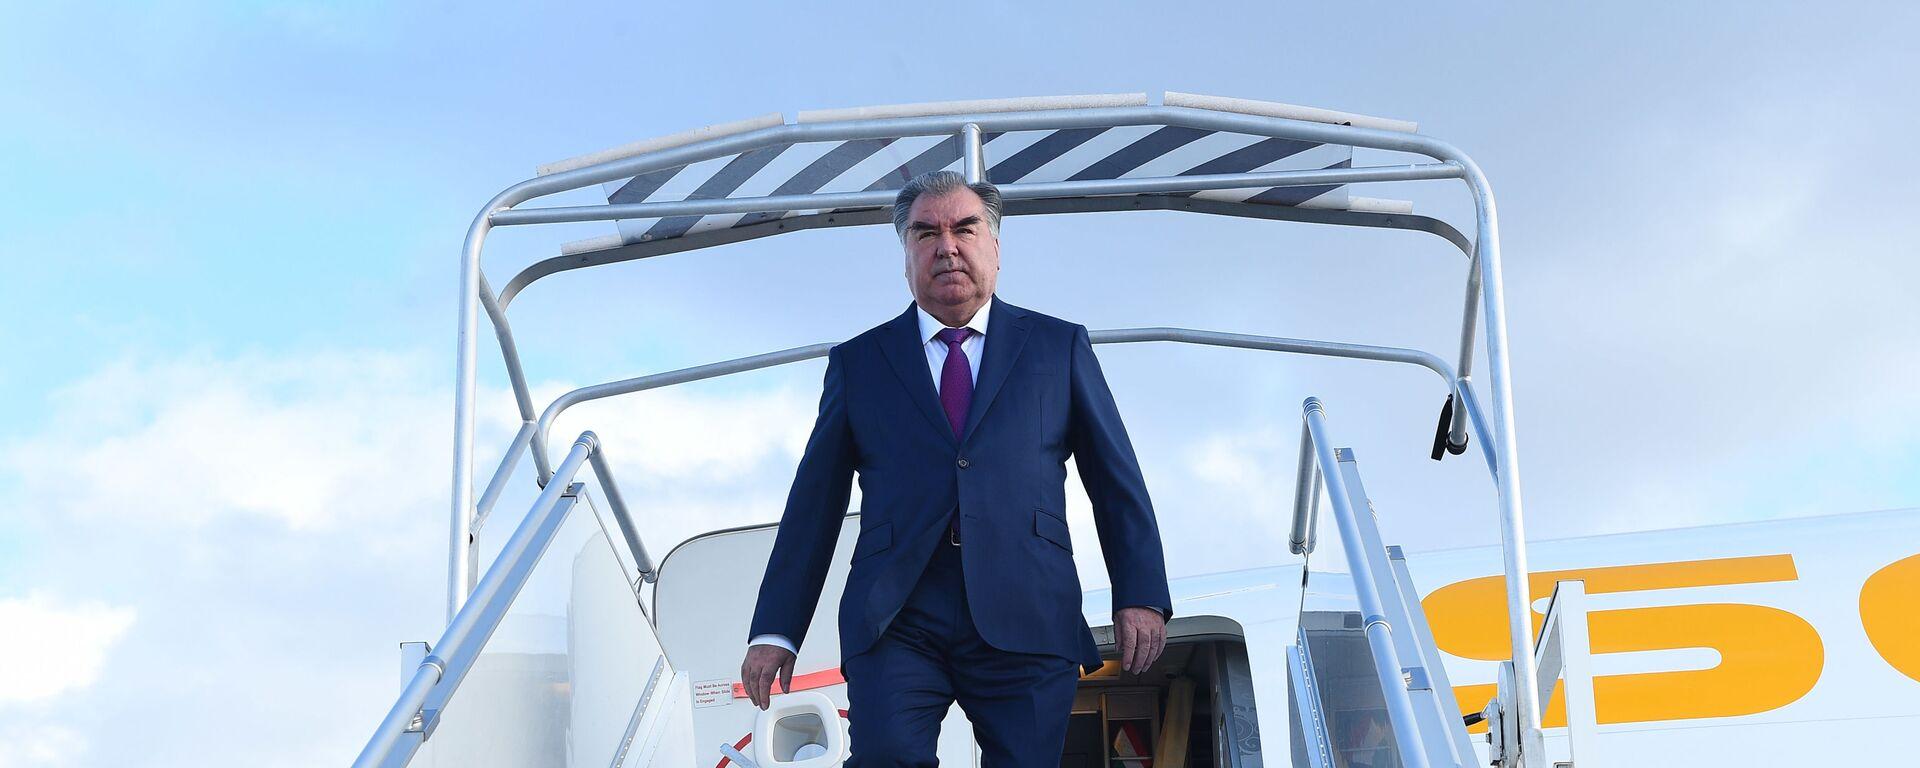 Президент Республики Таджикистан Эмомали Рахмон - Sputnik Тоҷикистон, 1920, 28.07.2021